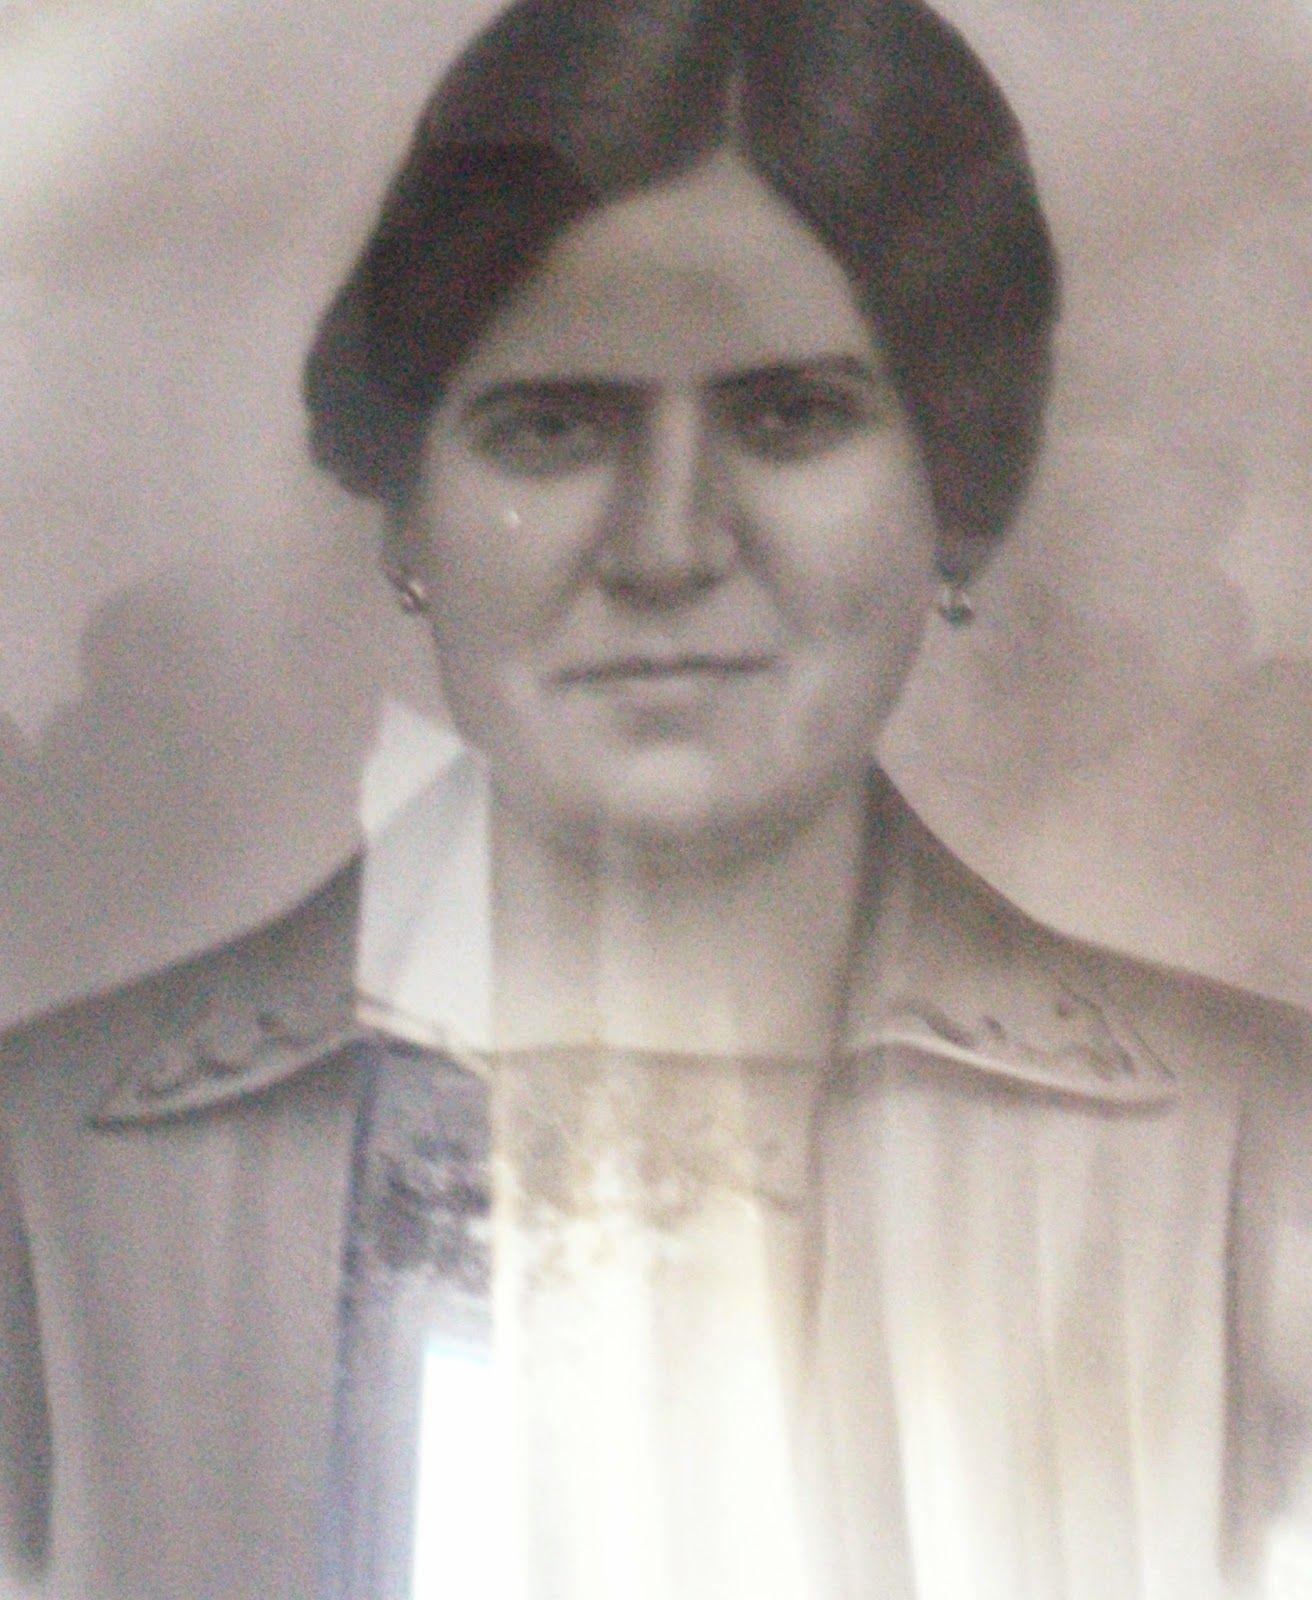 MOXOΣ...Αδερφή του Χαρίλαου Αρχοντάκη